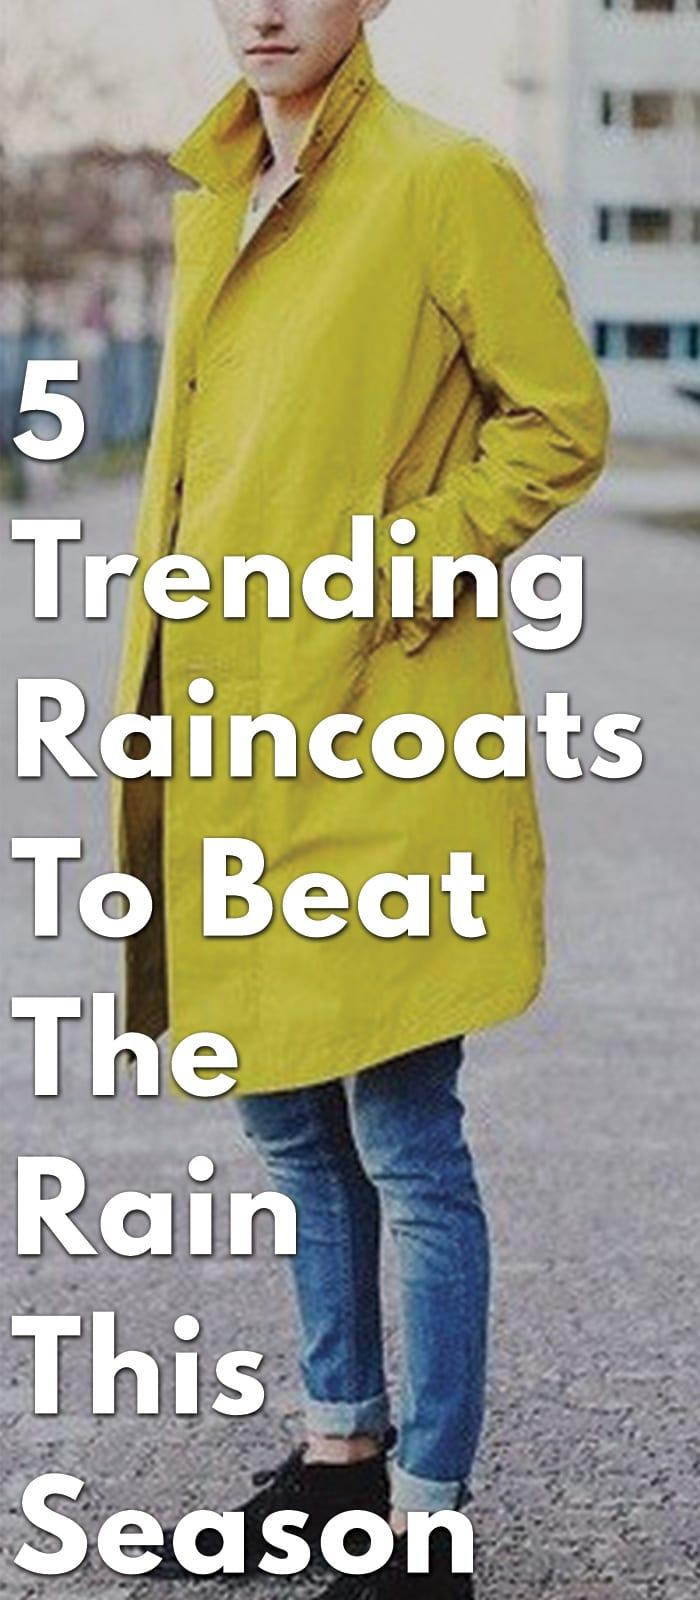 5-Trending-Raincoats-To-Beat-The-Rain-This-Season